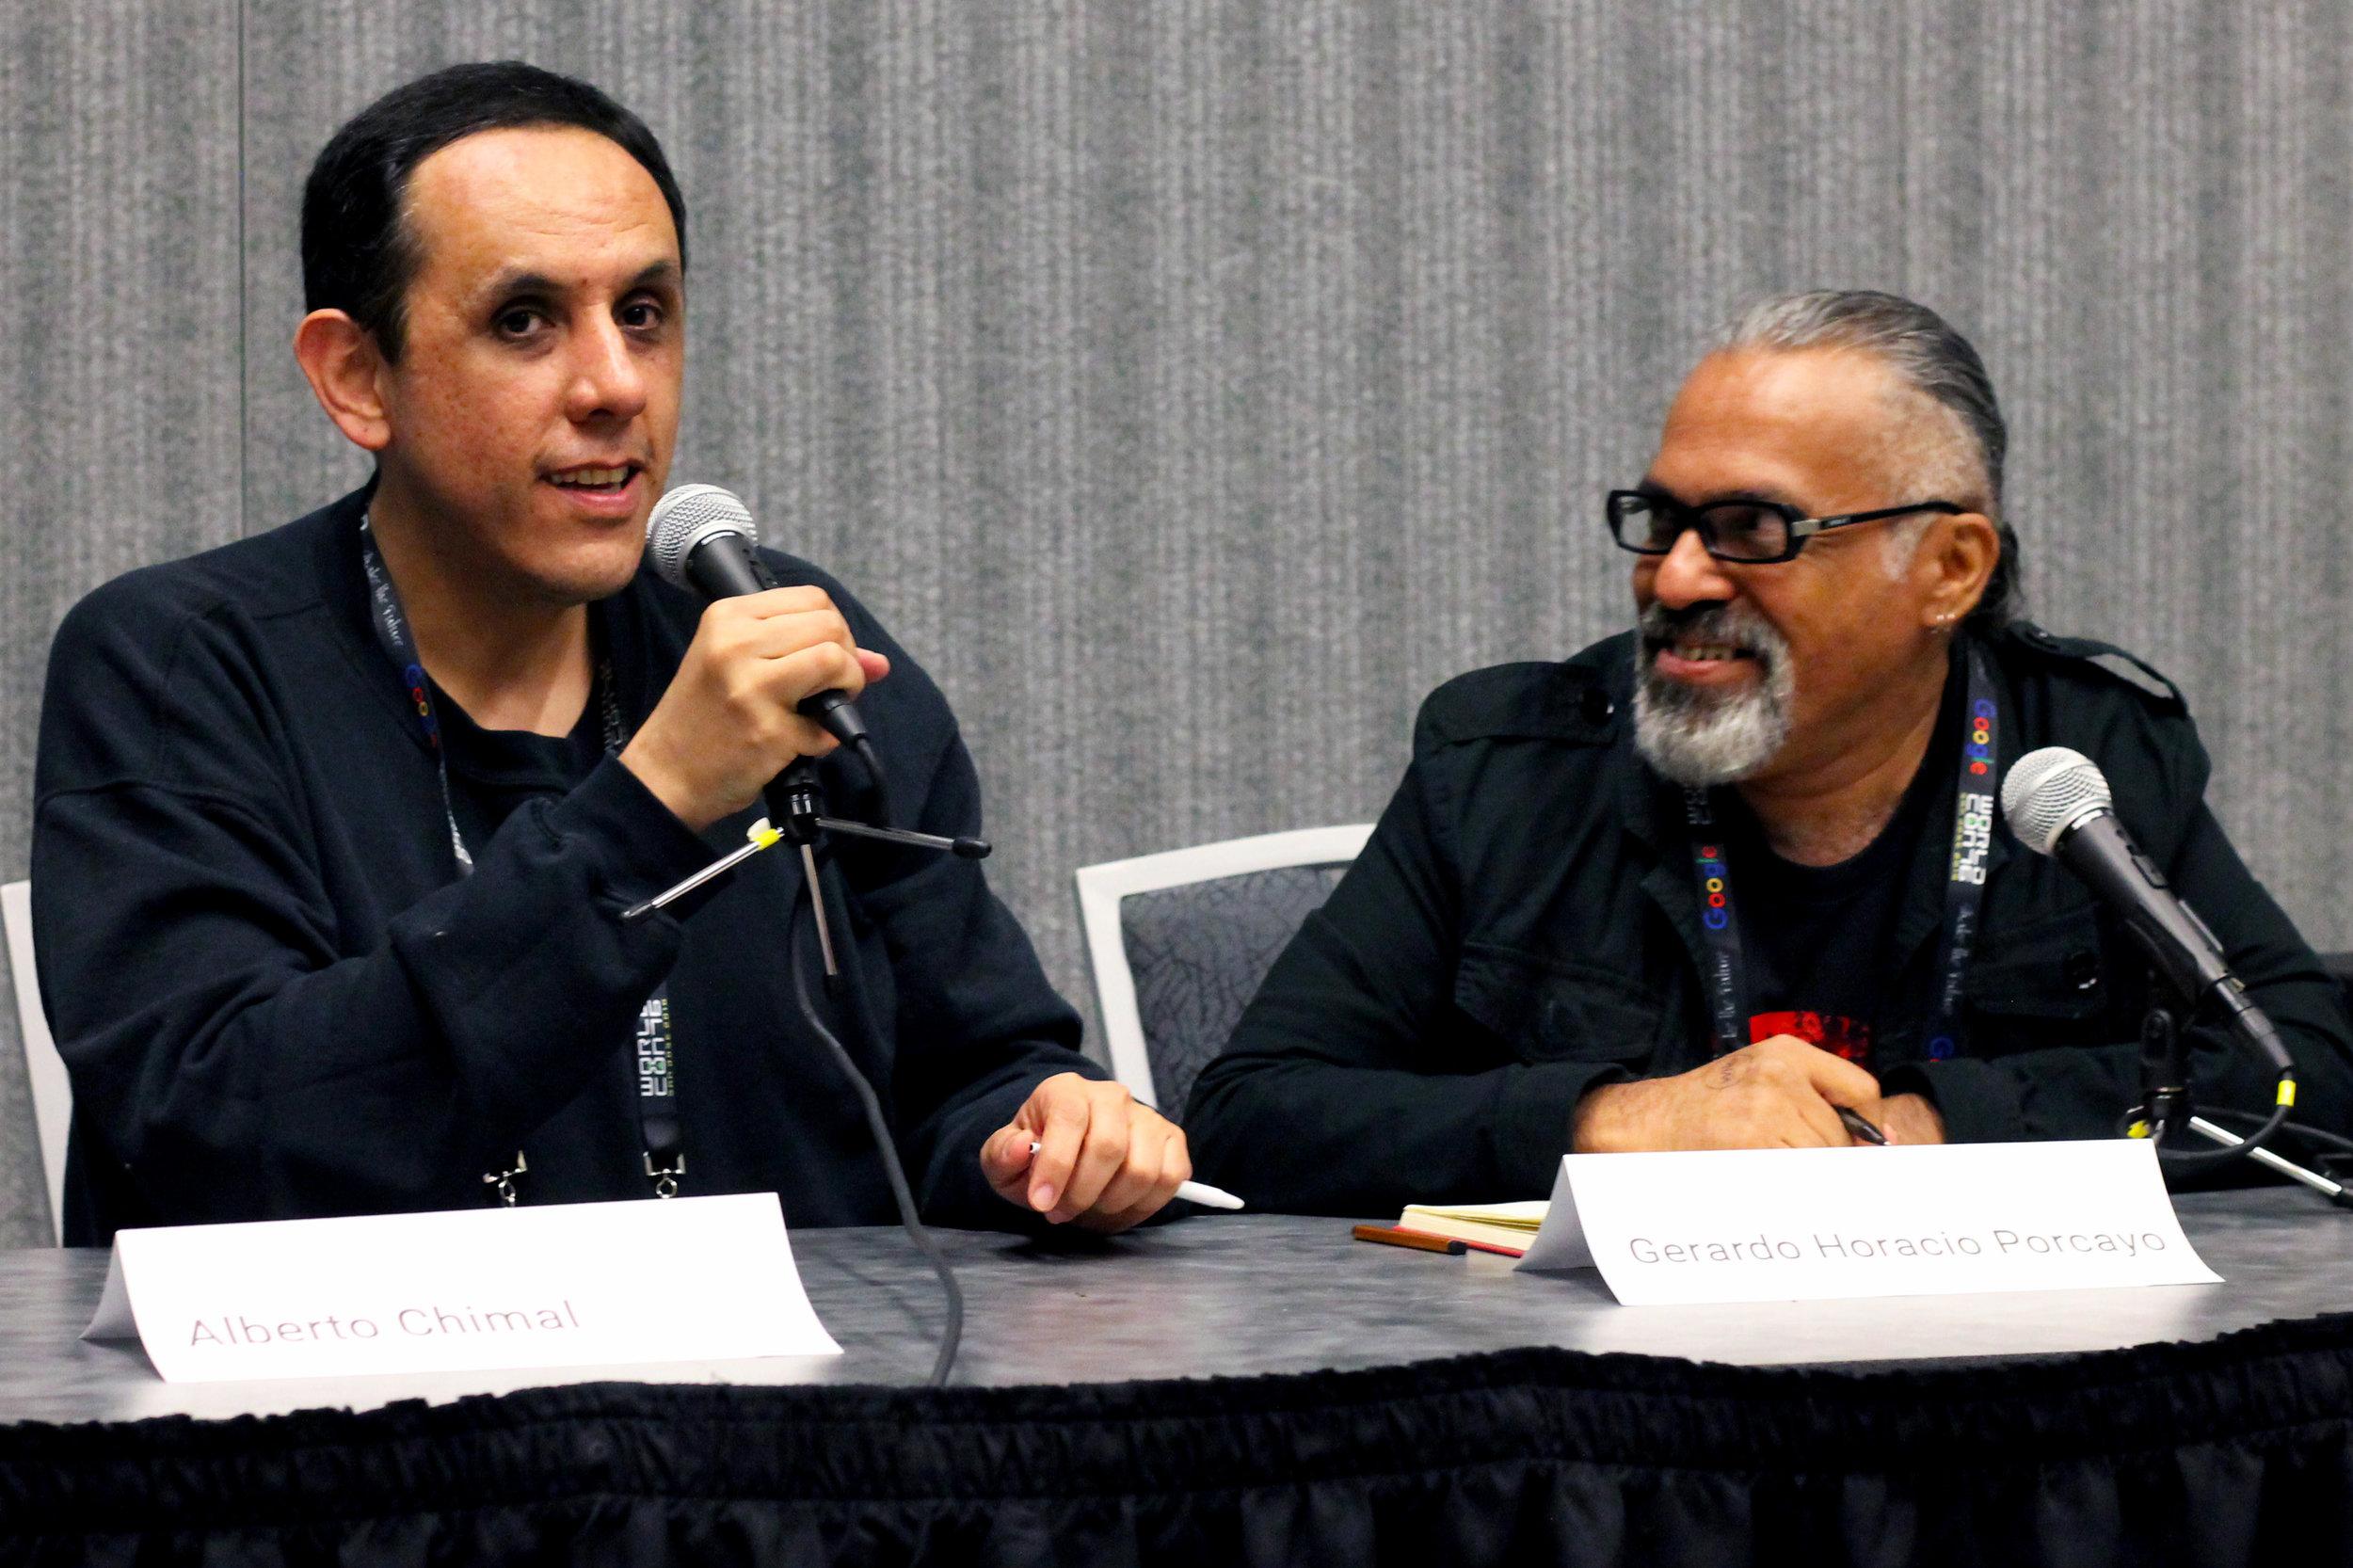 Alberto Chimal and Gerardo Horacio Porcayo at the history of Mexicanx Sci-Fi panel (Sent byJulia Rios; photo by Kateryna Barnes)